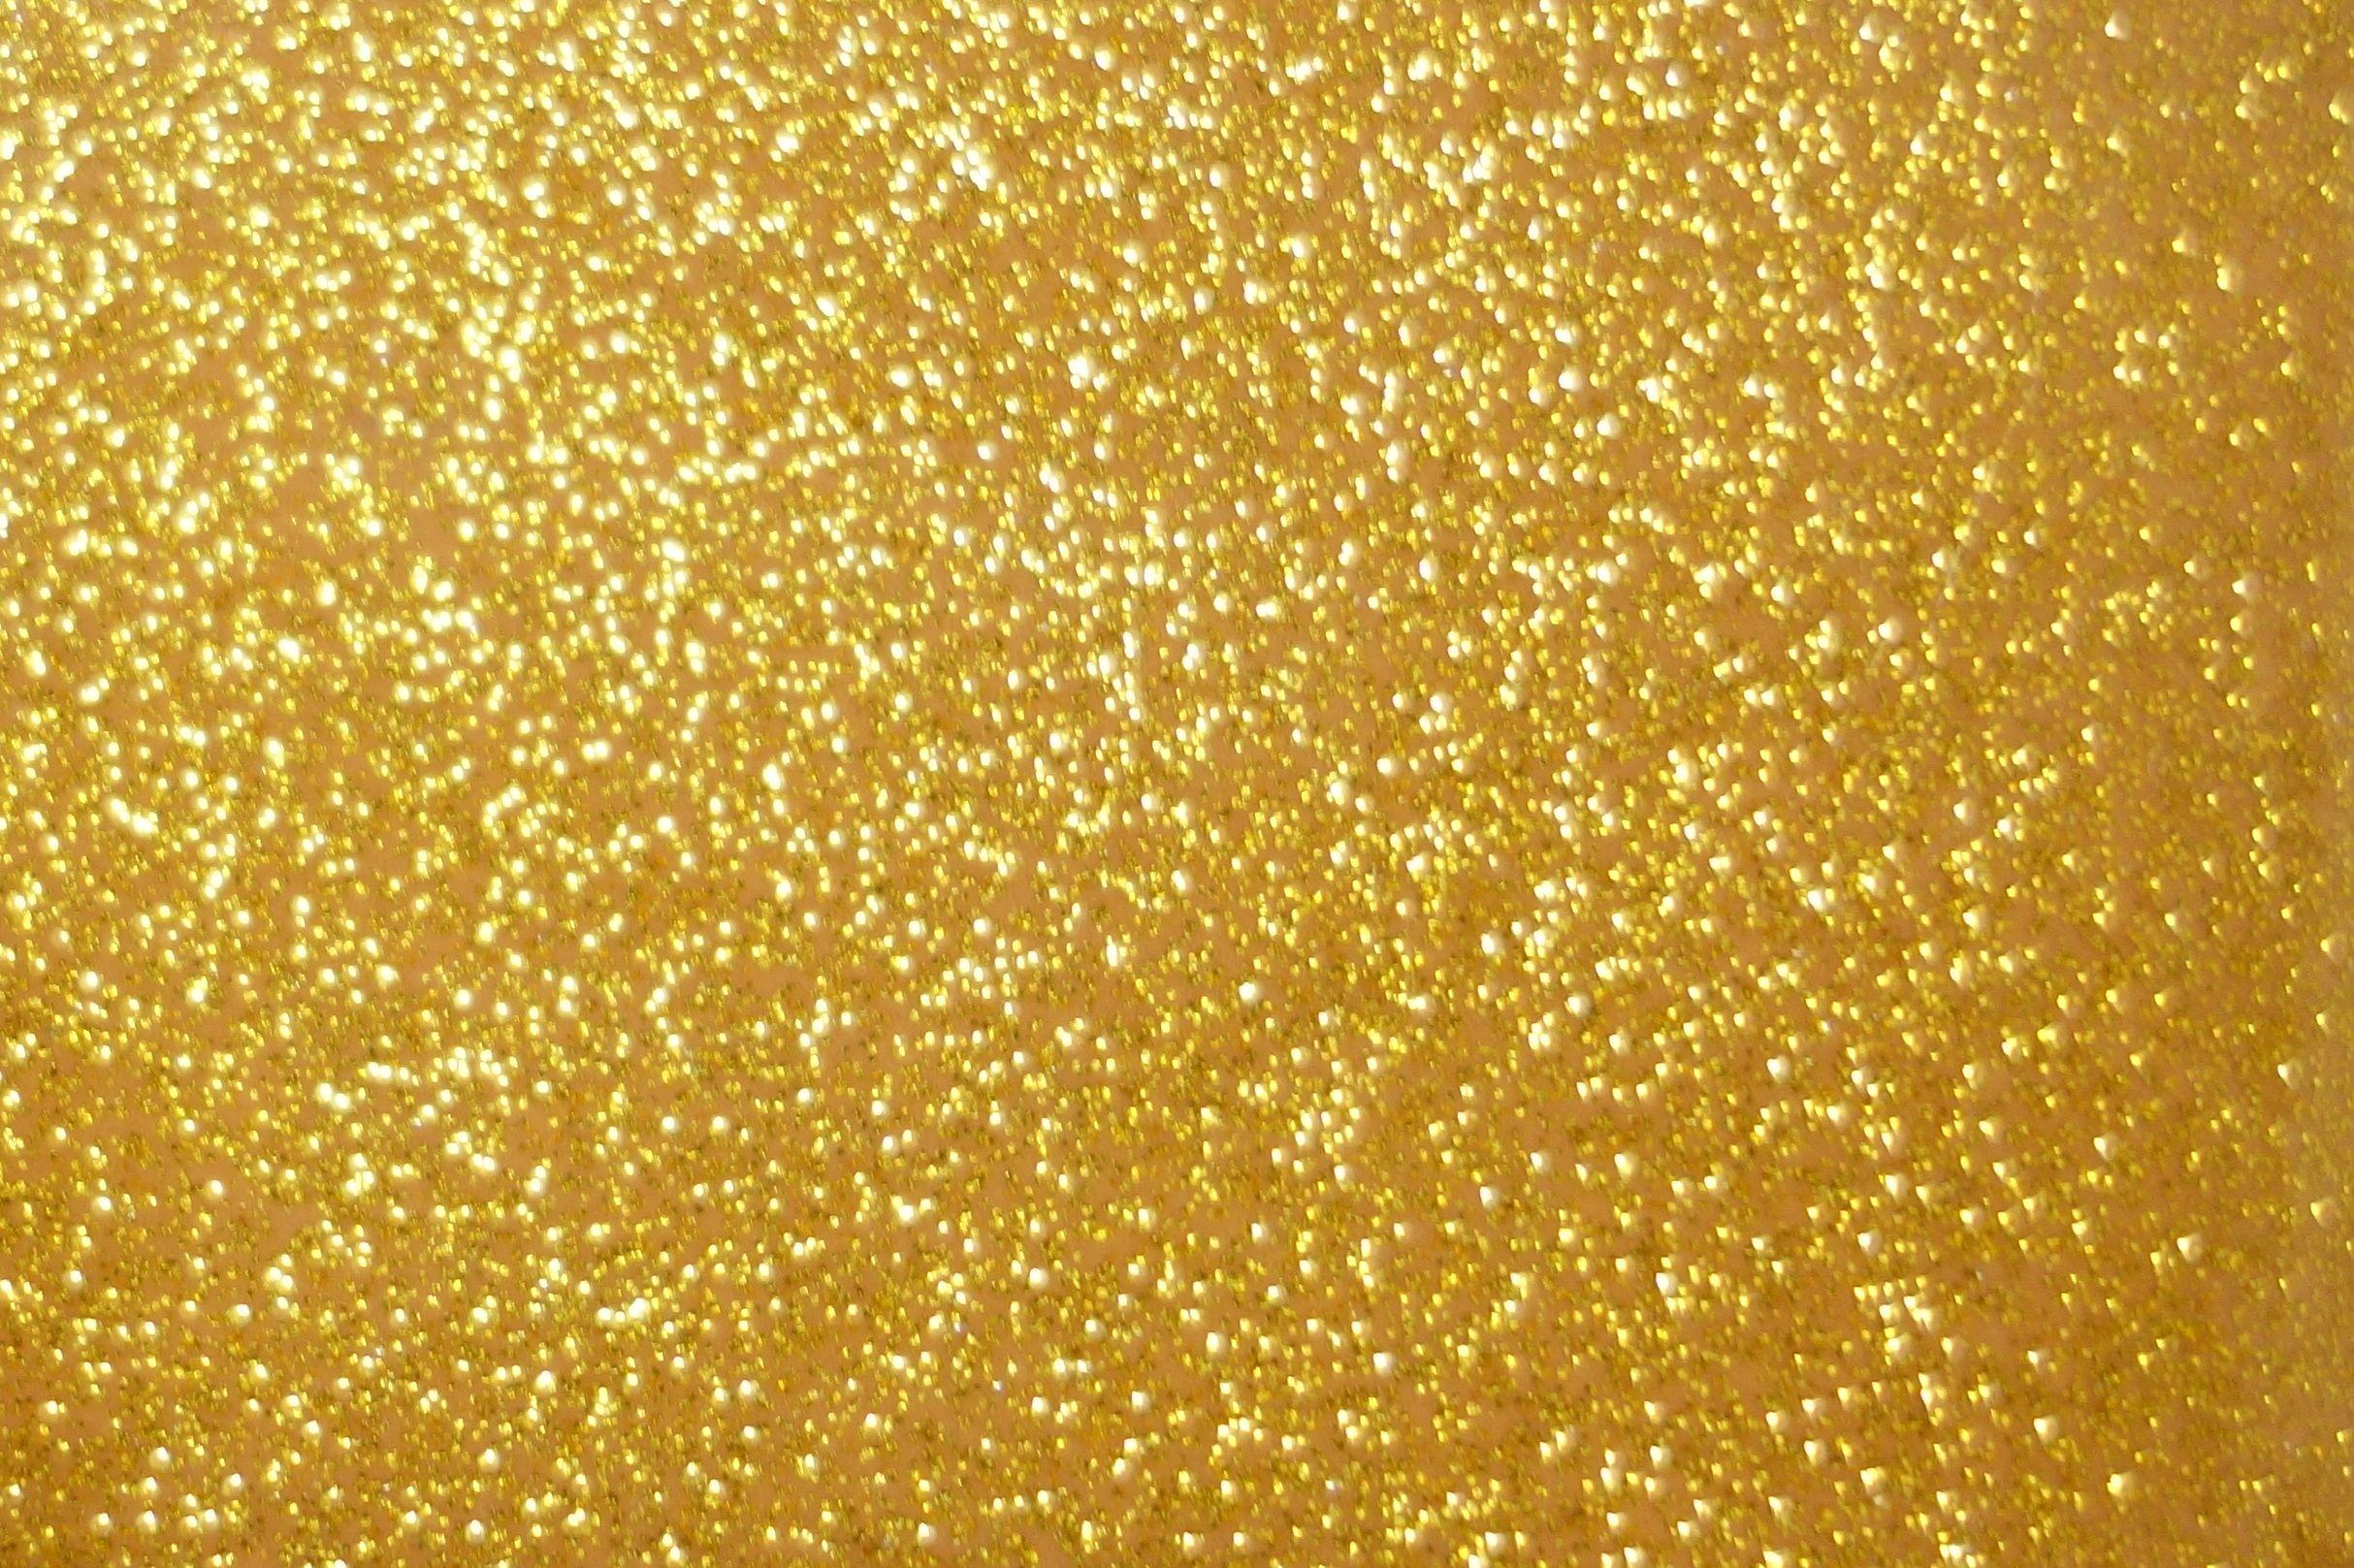 #Sparkles #Yellow #Gold | Gold glitter background, Glitter ...